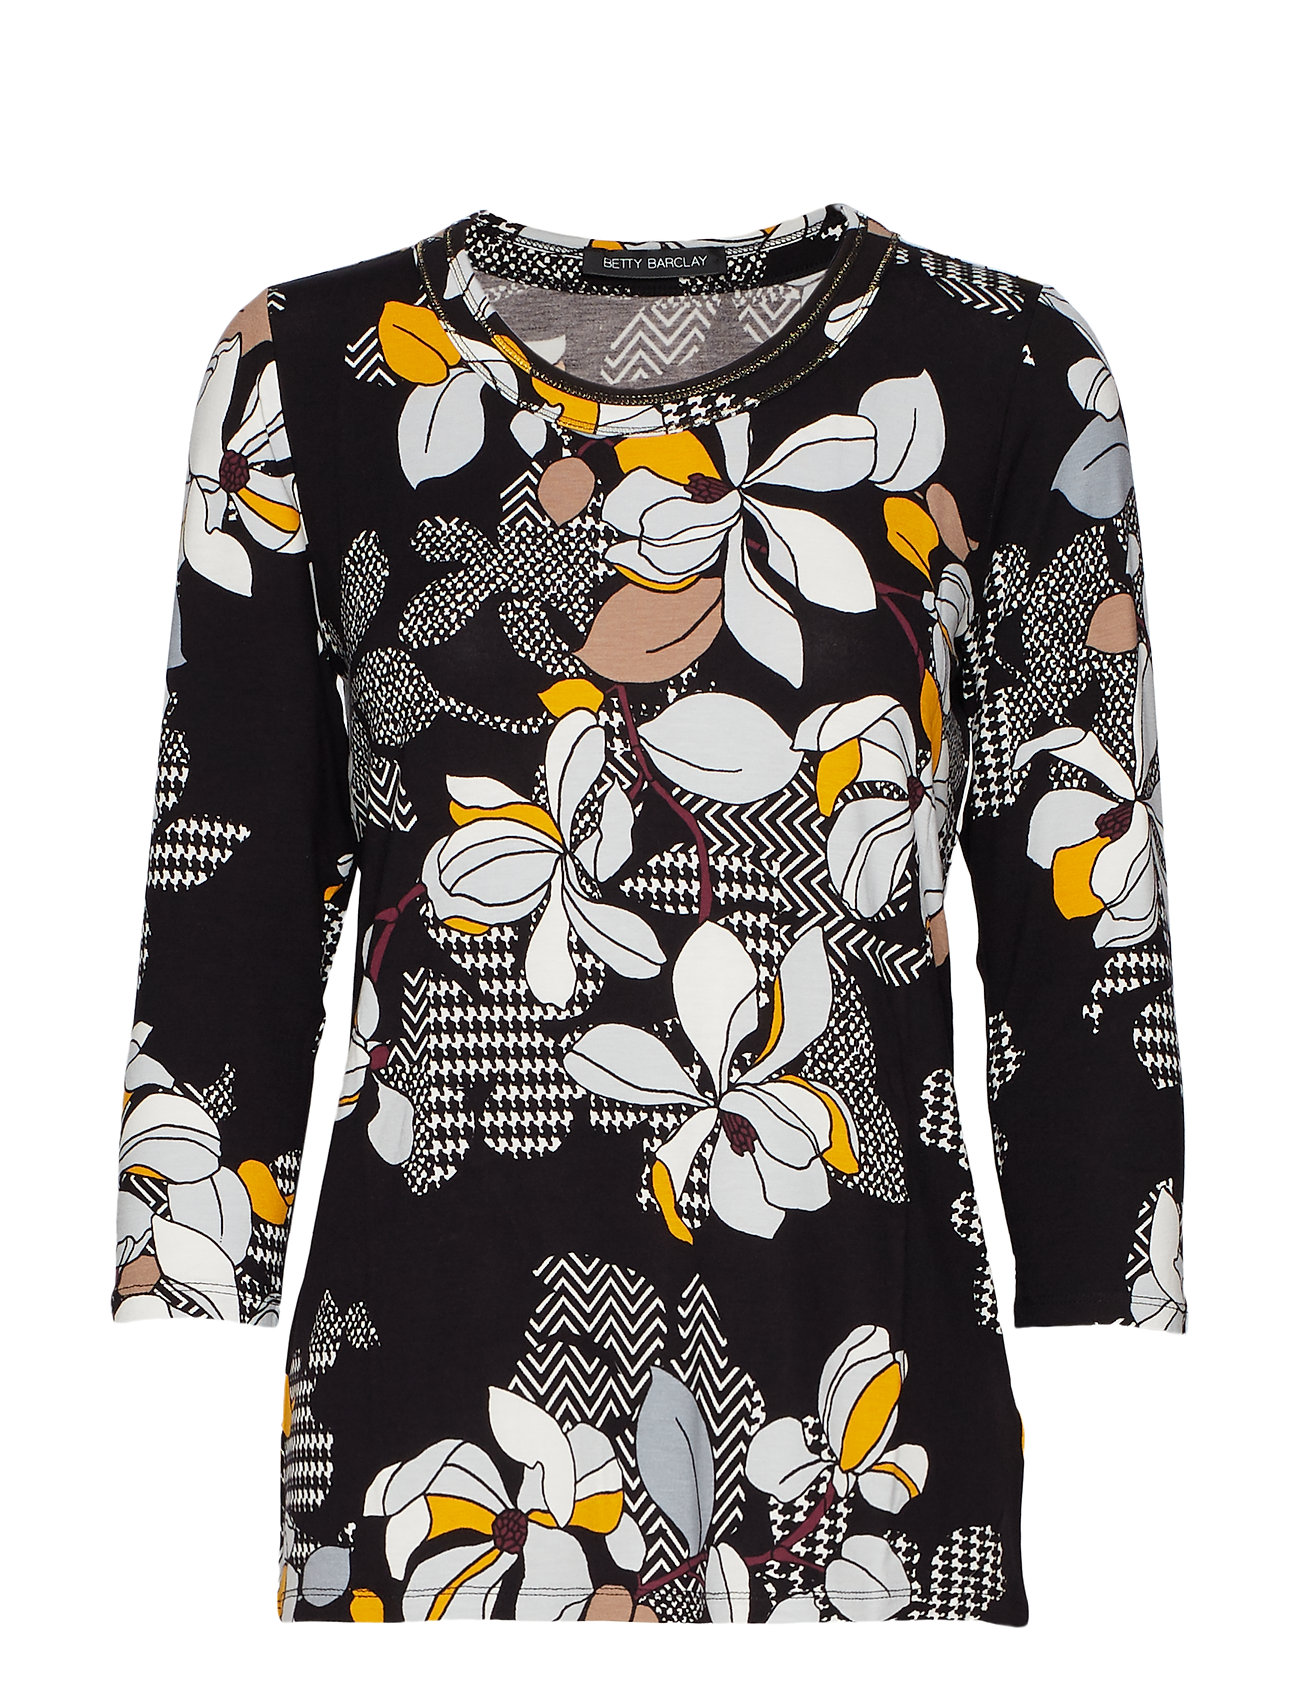 Image of Shirt Short 3/4 Sleeve Langærmet T-shirt Sort Betty Barclay (3217405637)